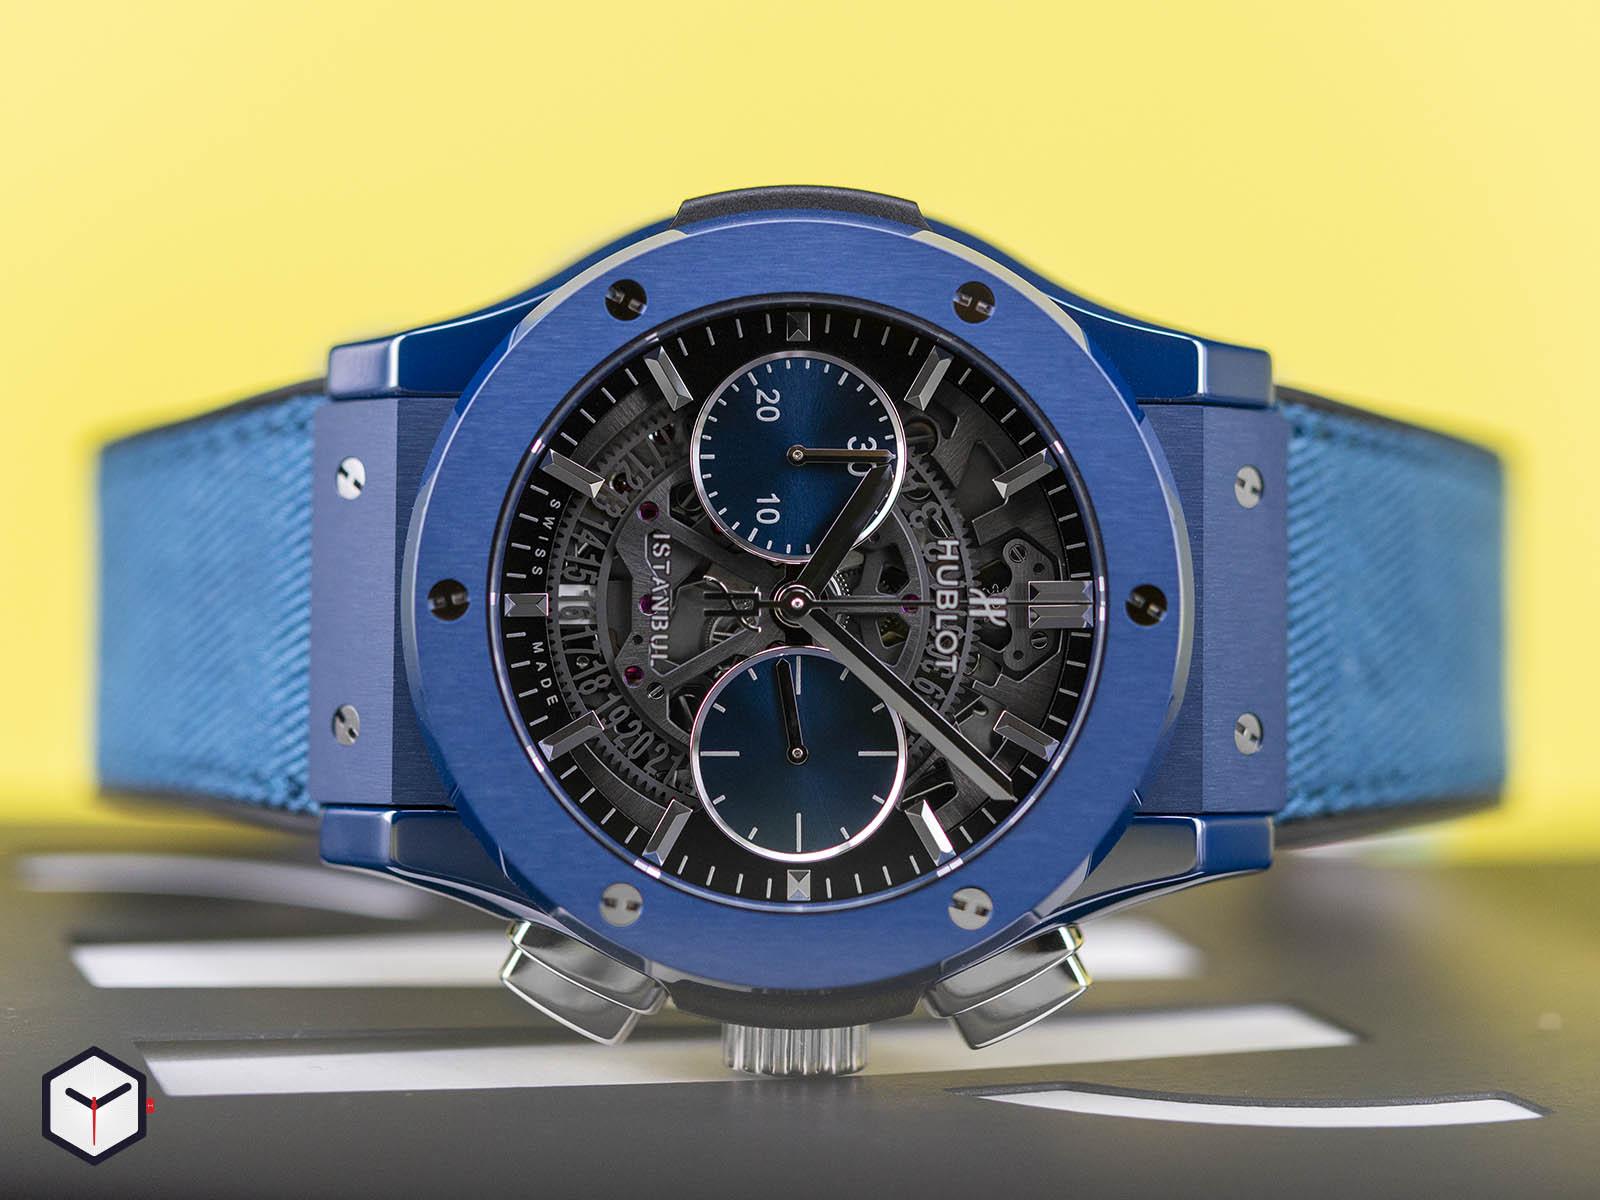 525-ex-1170-nr-bod18-hublot-classic-fusion-aerofusion-bosphorus-blue-2.jpg